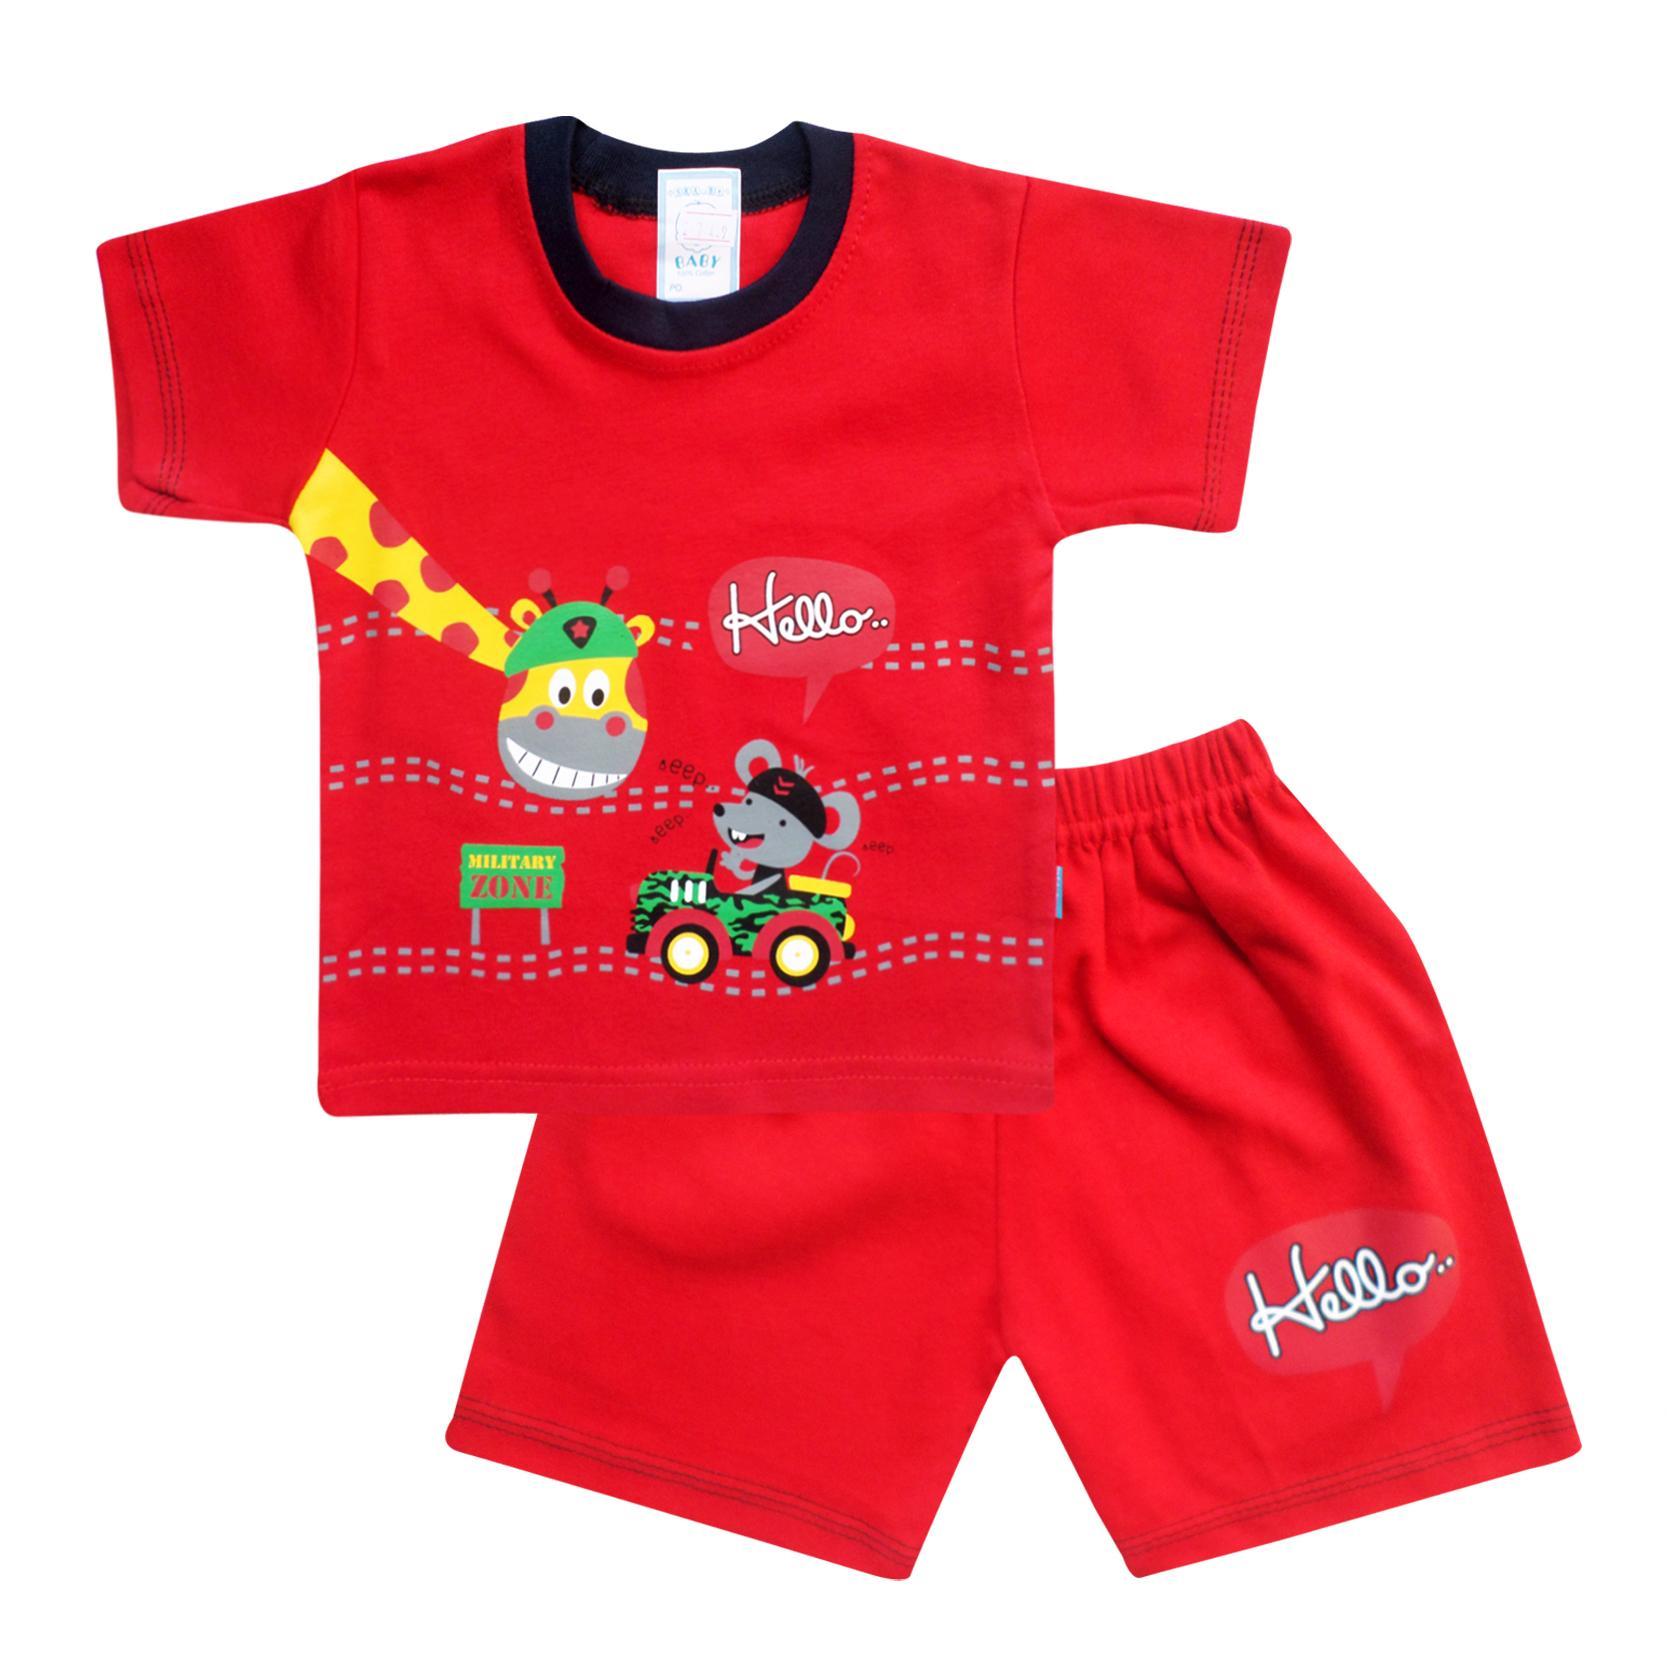 SKABe Baby Warna Tua Baju Anak Laki Laki Tangan Pendek Setelan Kaos 2749